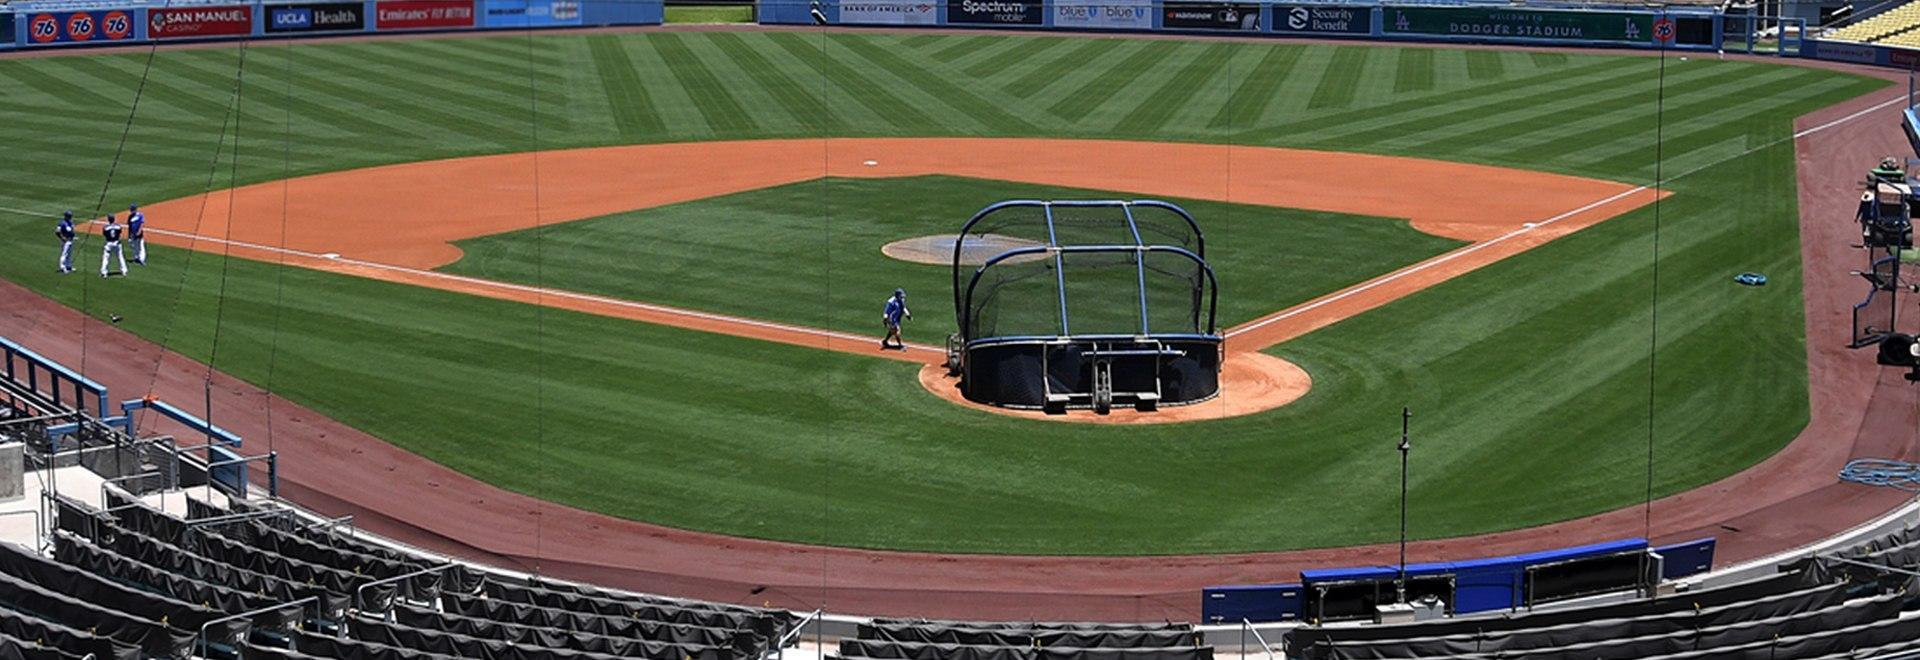 Tampa Bay - NY Yankees. ALDS Gara 5